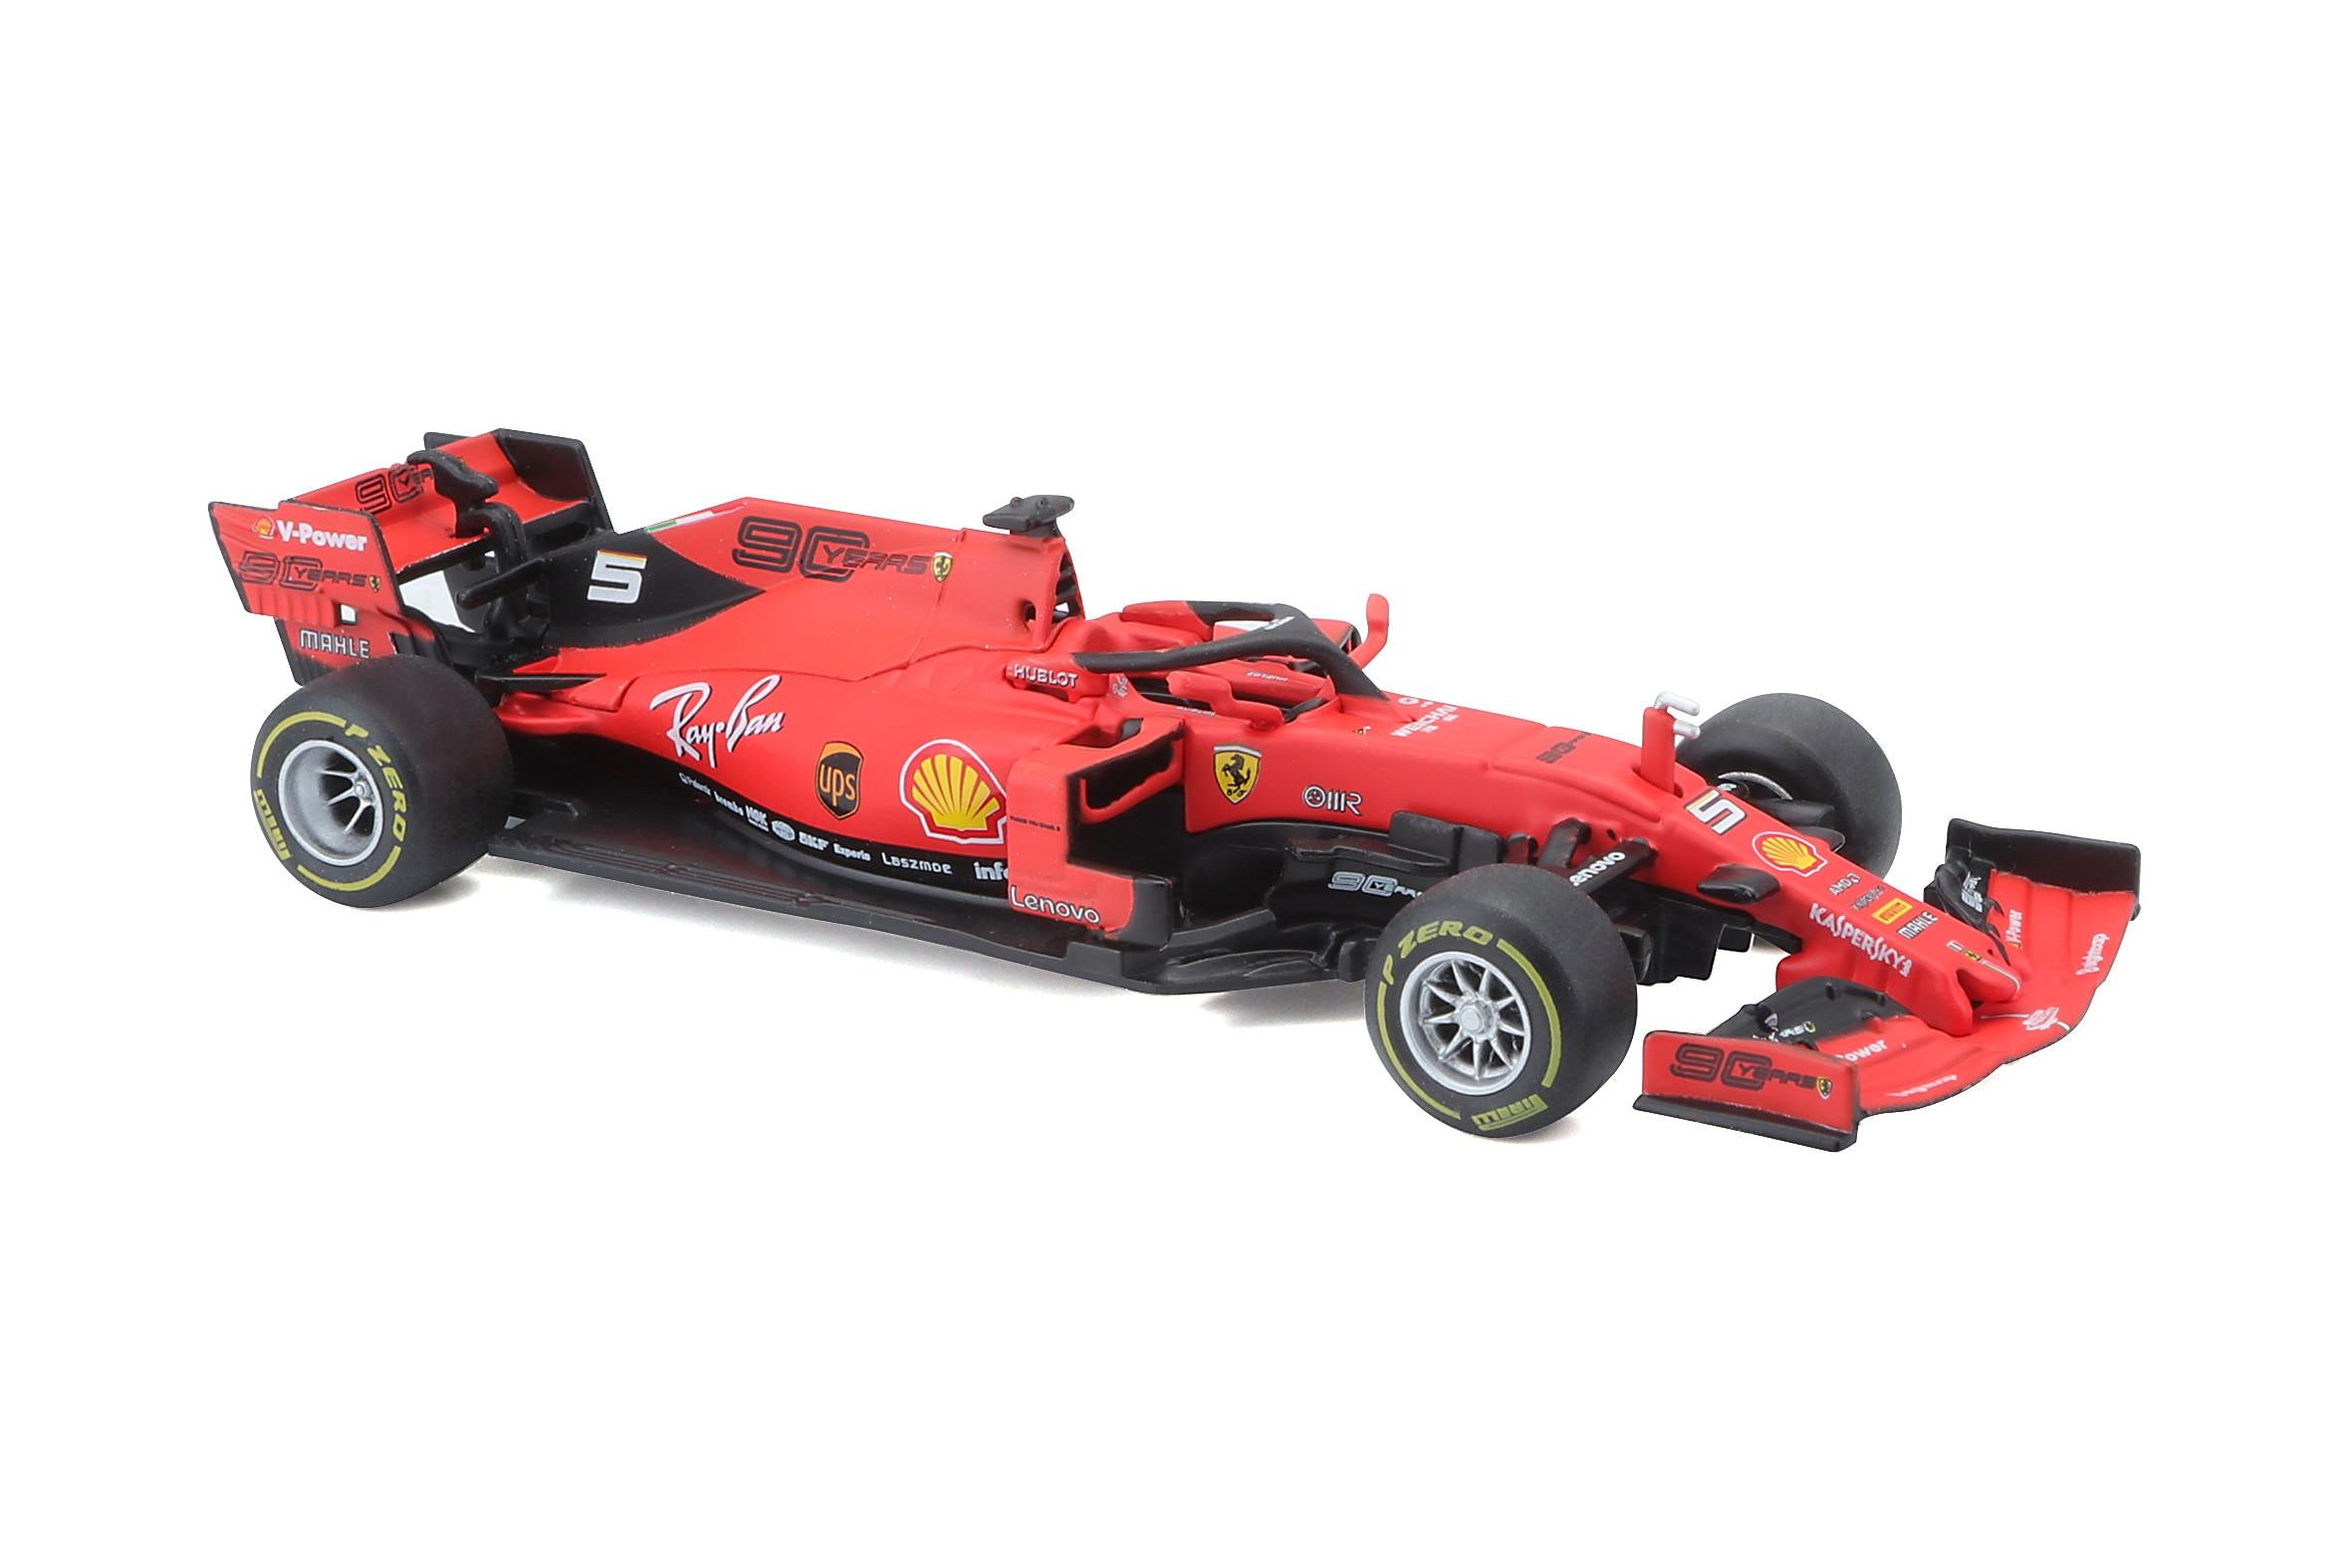 BBURAGO 1:43 2019 FERRARI F1 SF90 Model Racing CAR NEW IN BOX